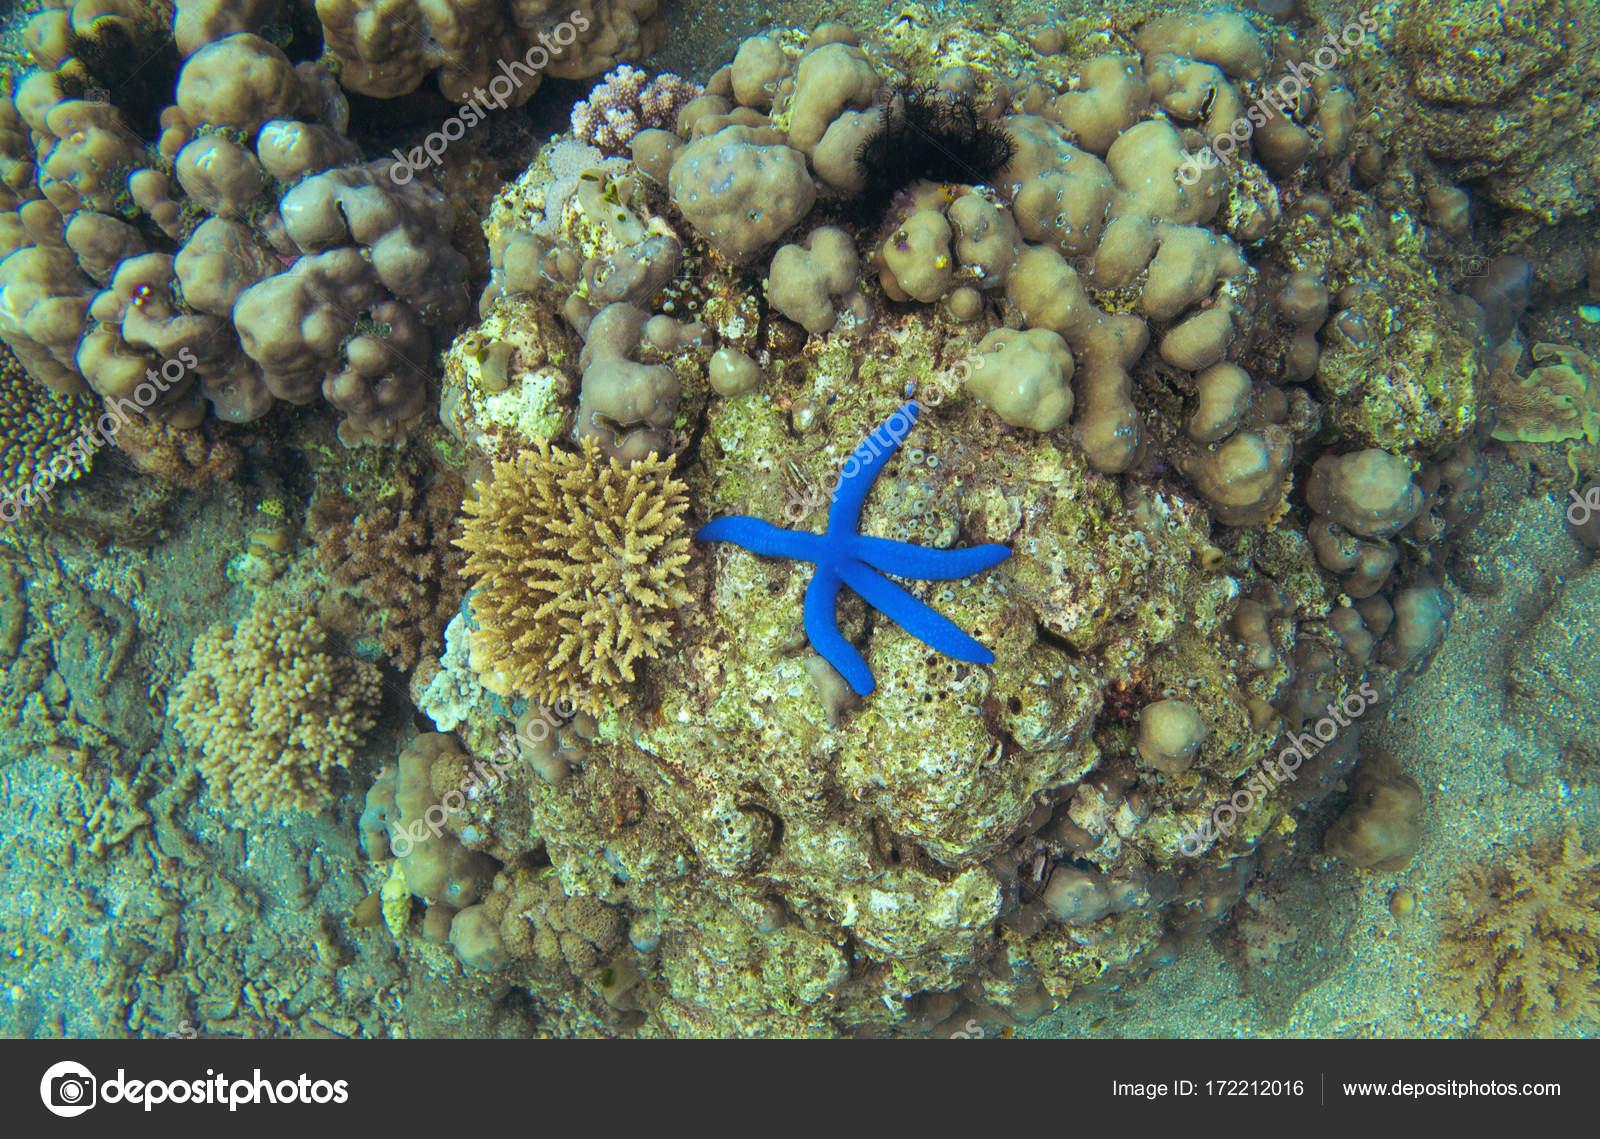 coral reef blue starfish top view starfish sea shore underwater